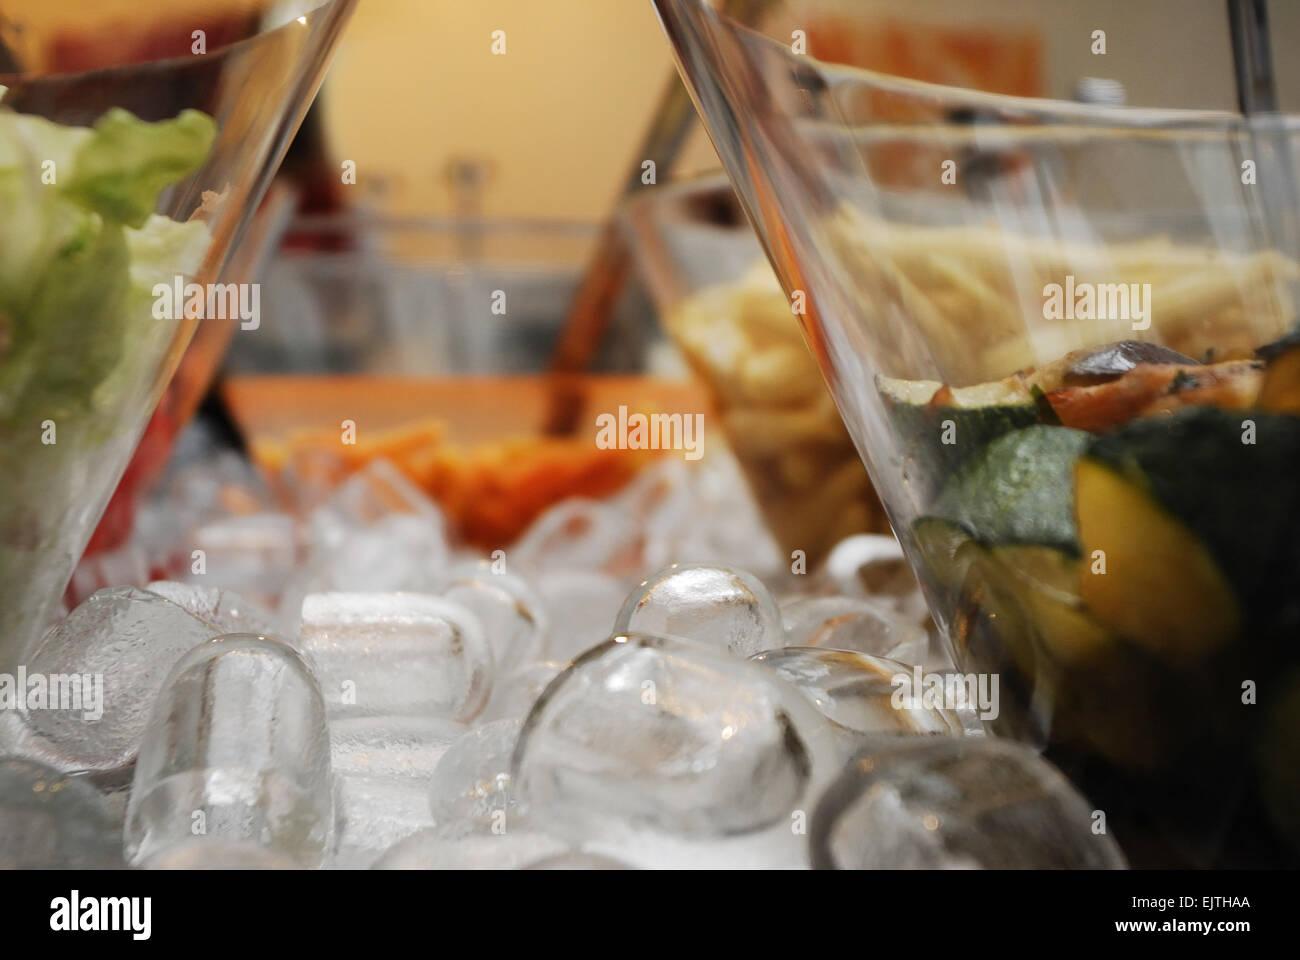 Salads on ice - Stock Image